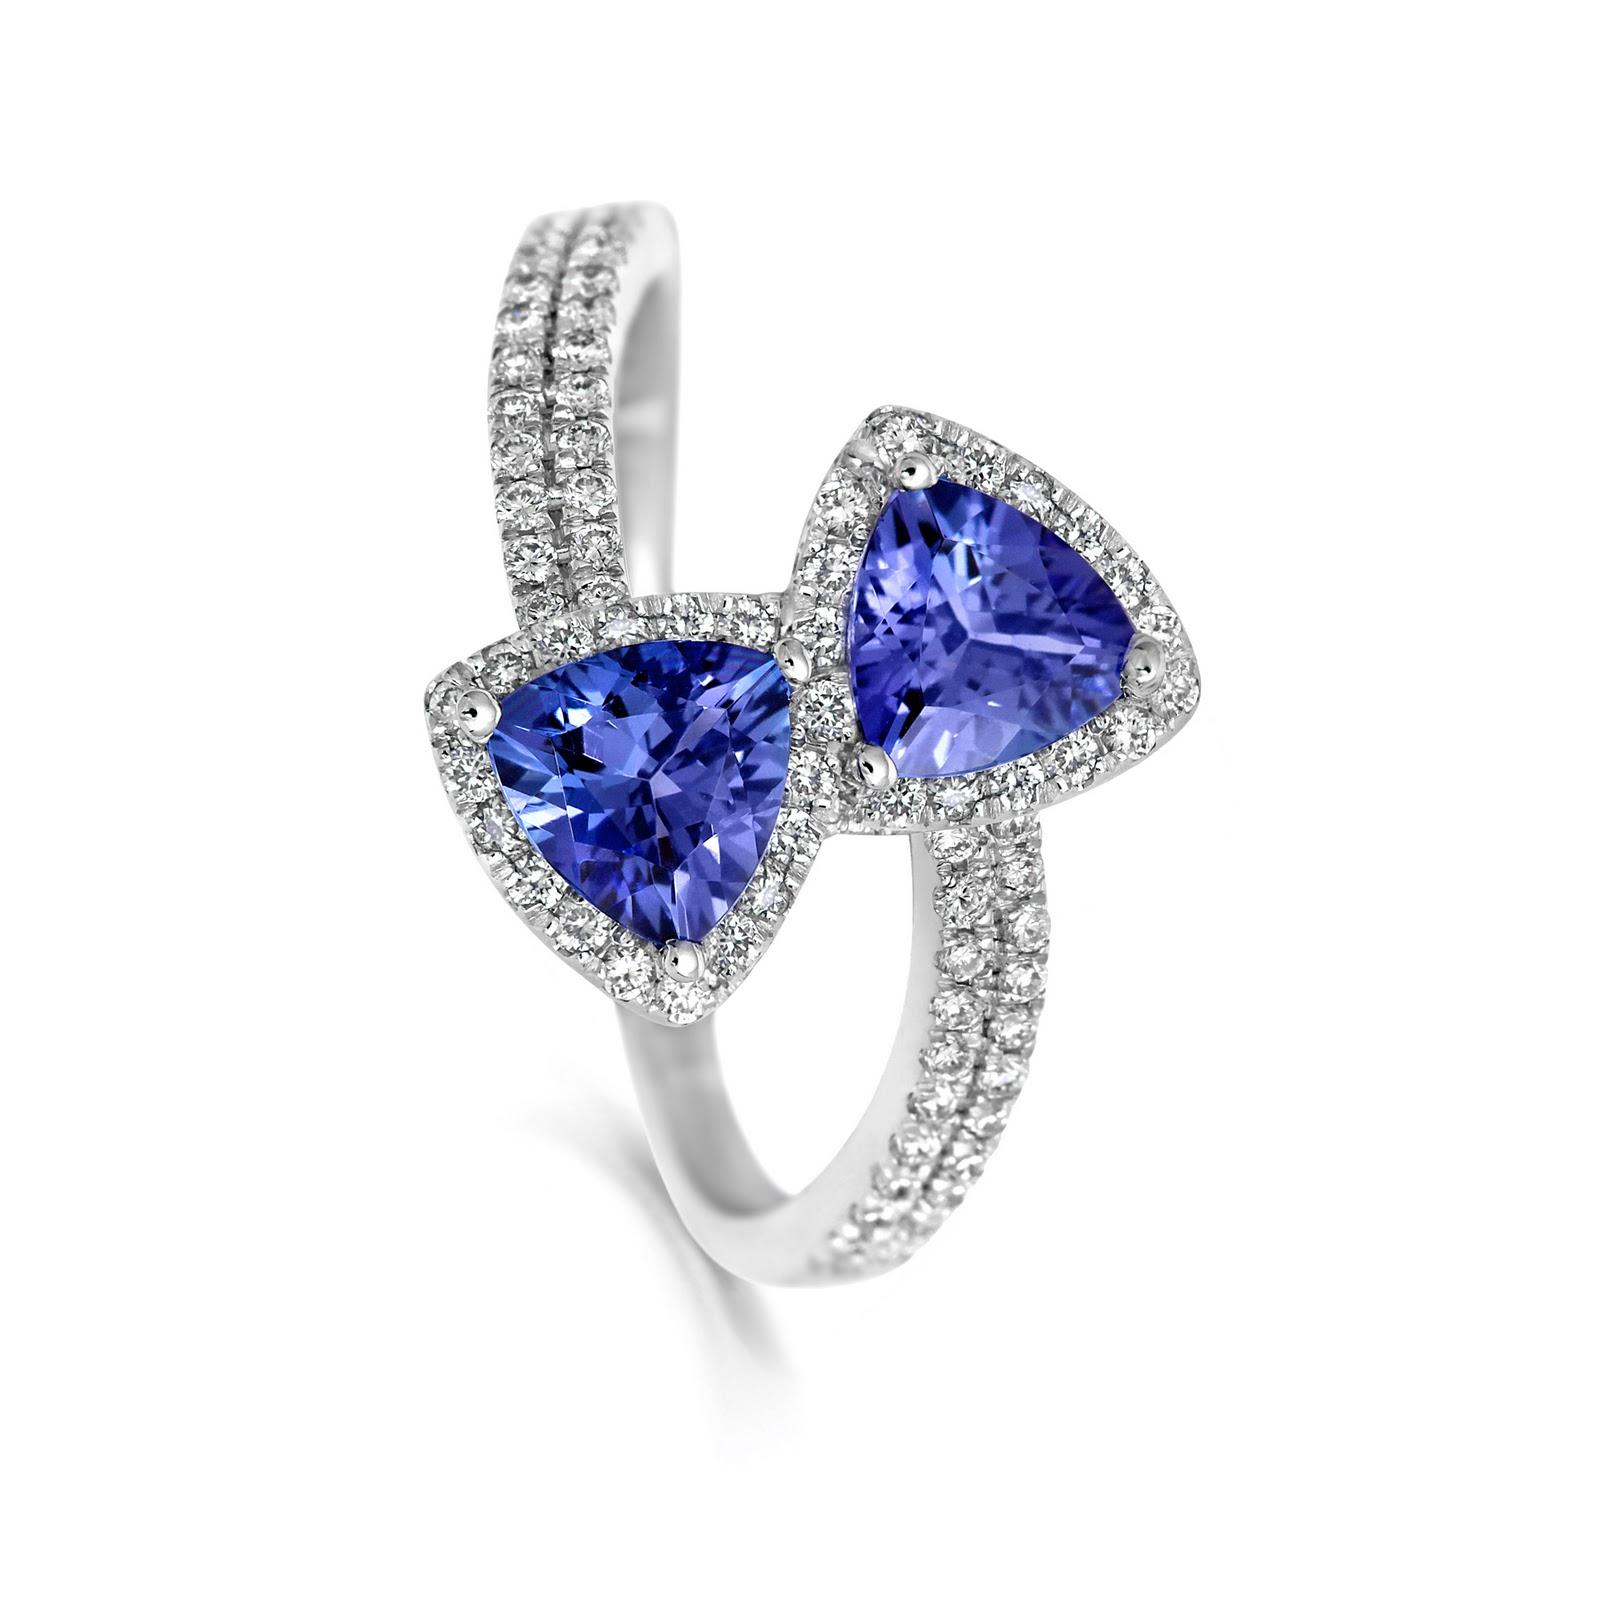 jewellery stores, jewellery online, jewellery fashion, indian jewellery designs, indian jewellery, jewellery definition, jewellery making, jewellery exchange-112